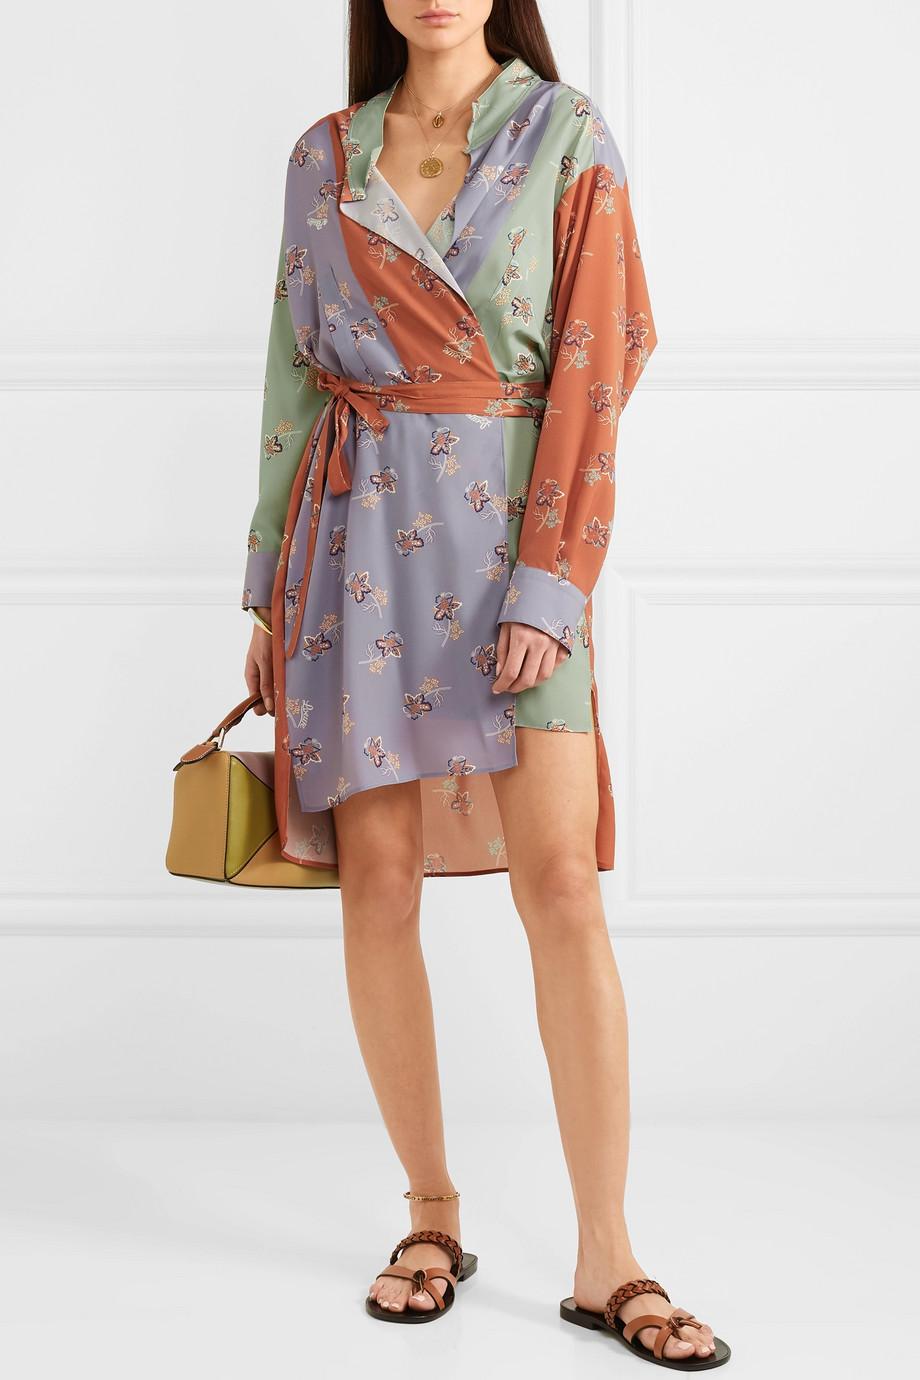 Loewe + Paula's Ibiza belted printed crepe de chine wrap dress